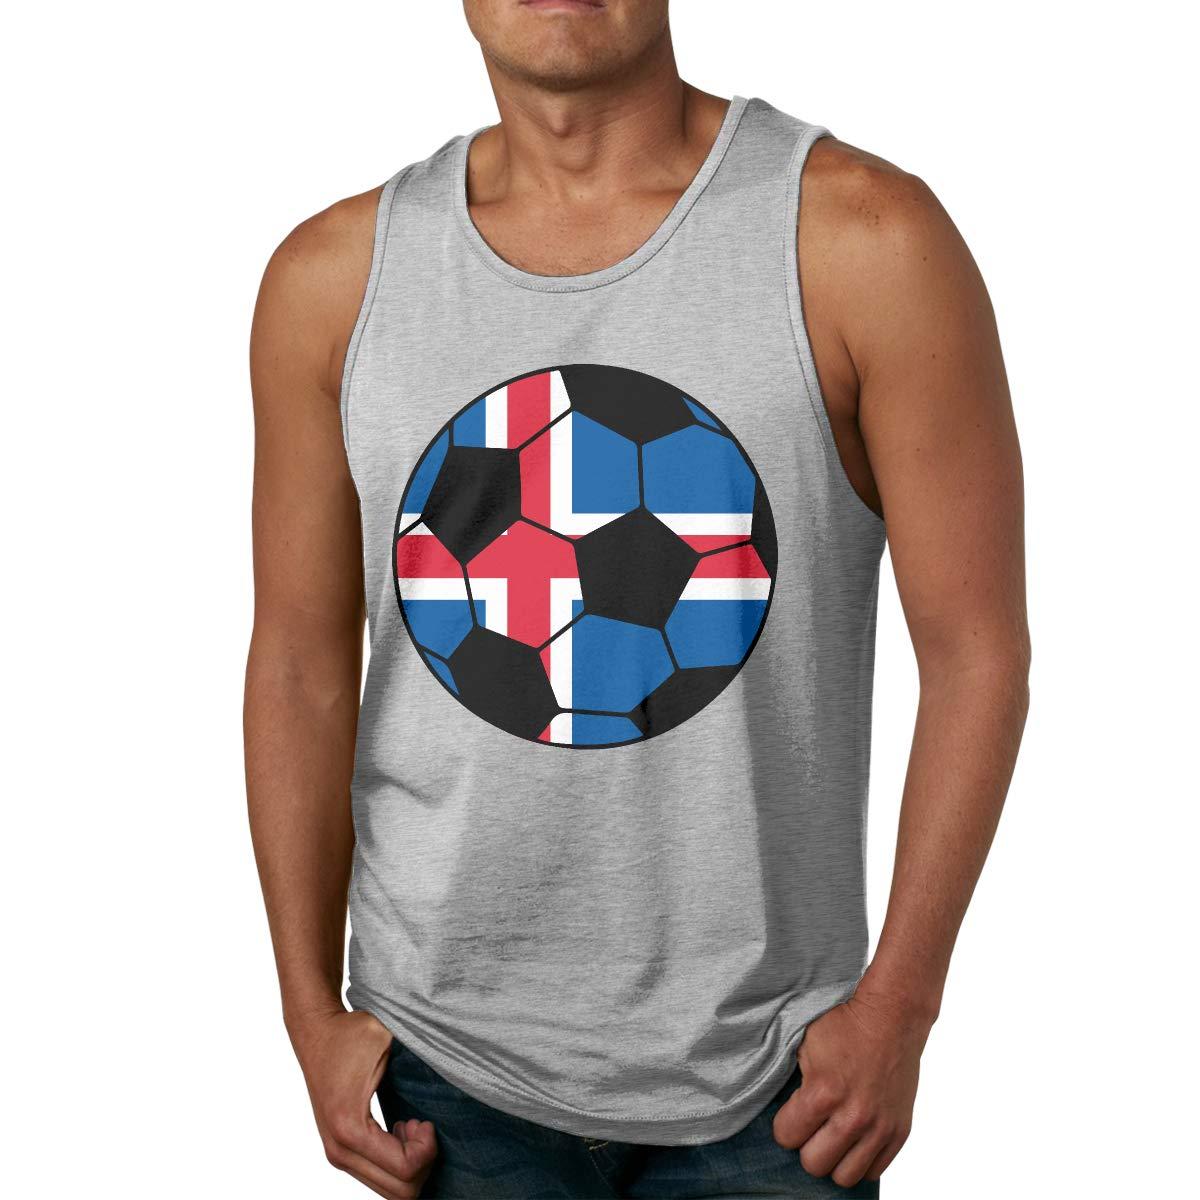 Men Tank Top Super Soft Iceland Soccer Flag 100/% Cotton Cami